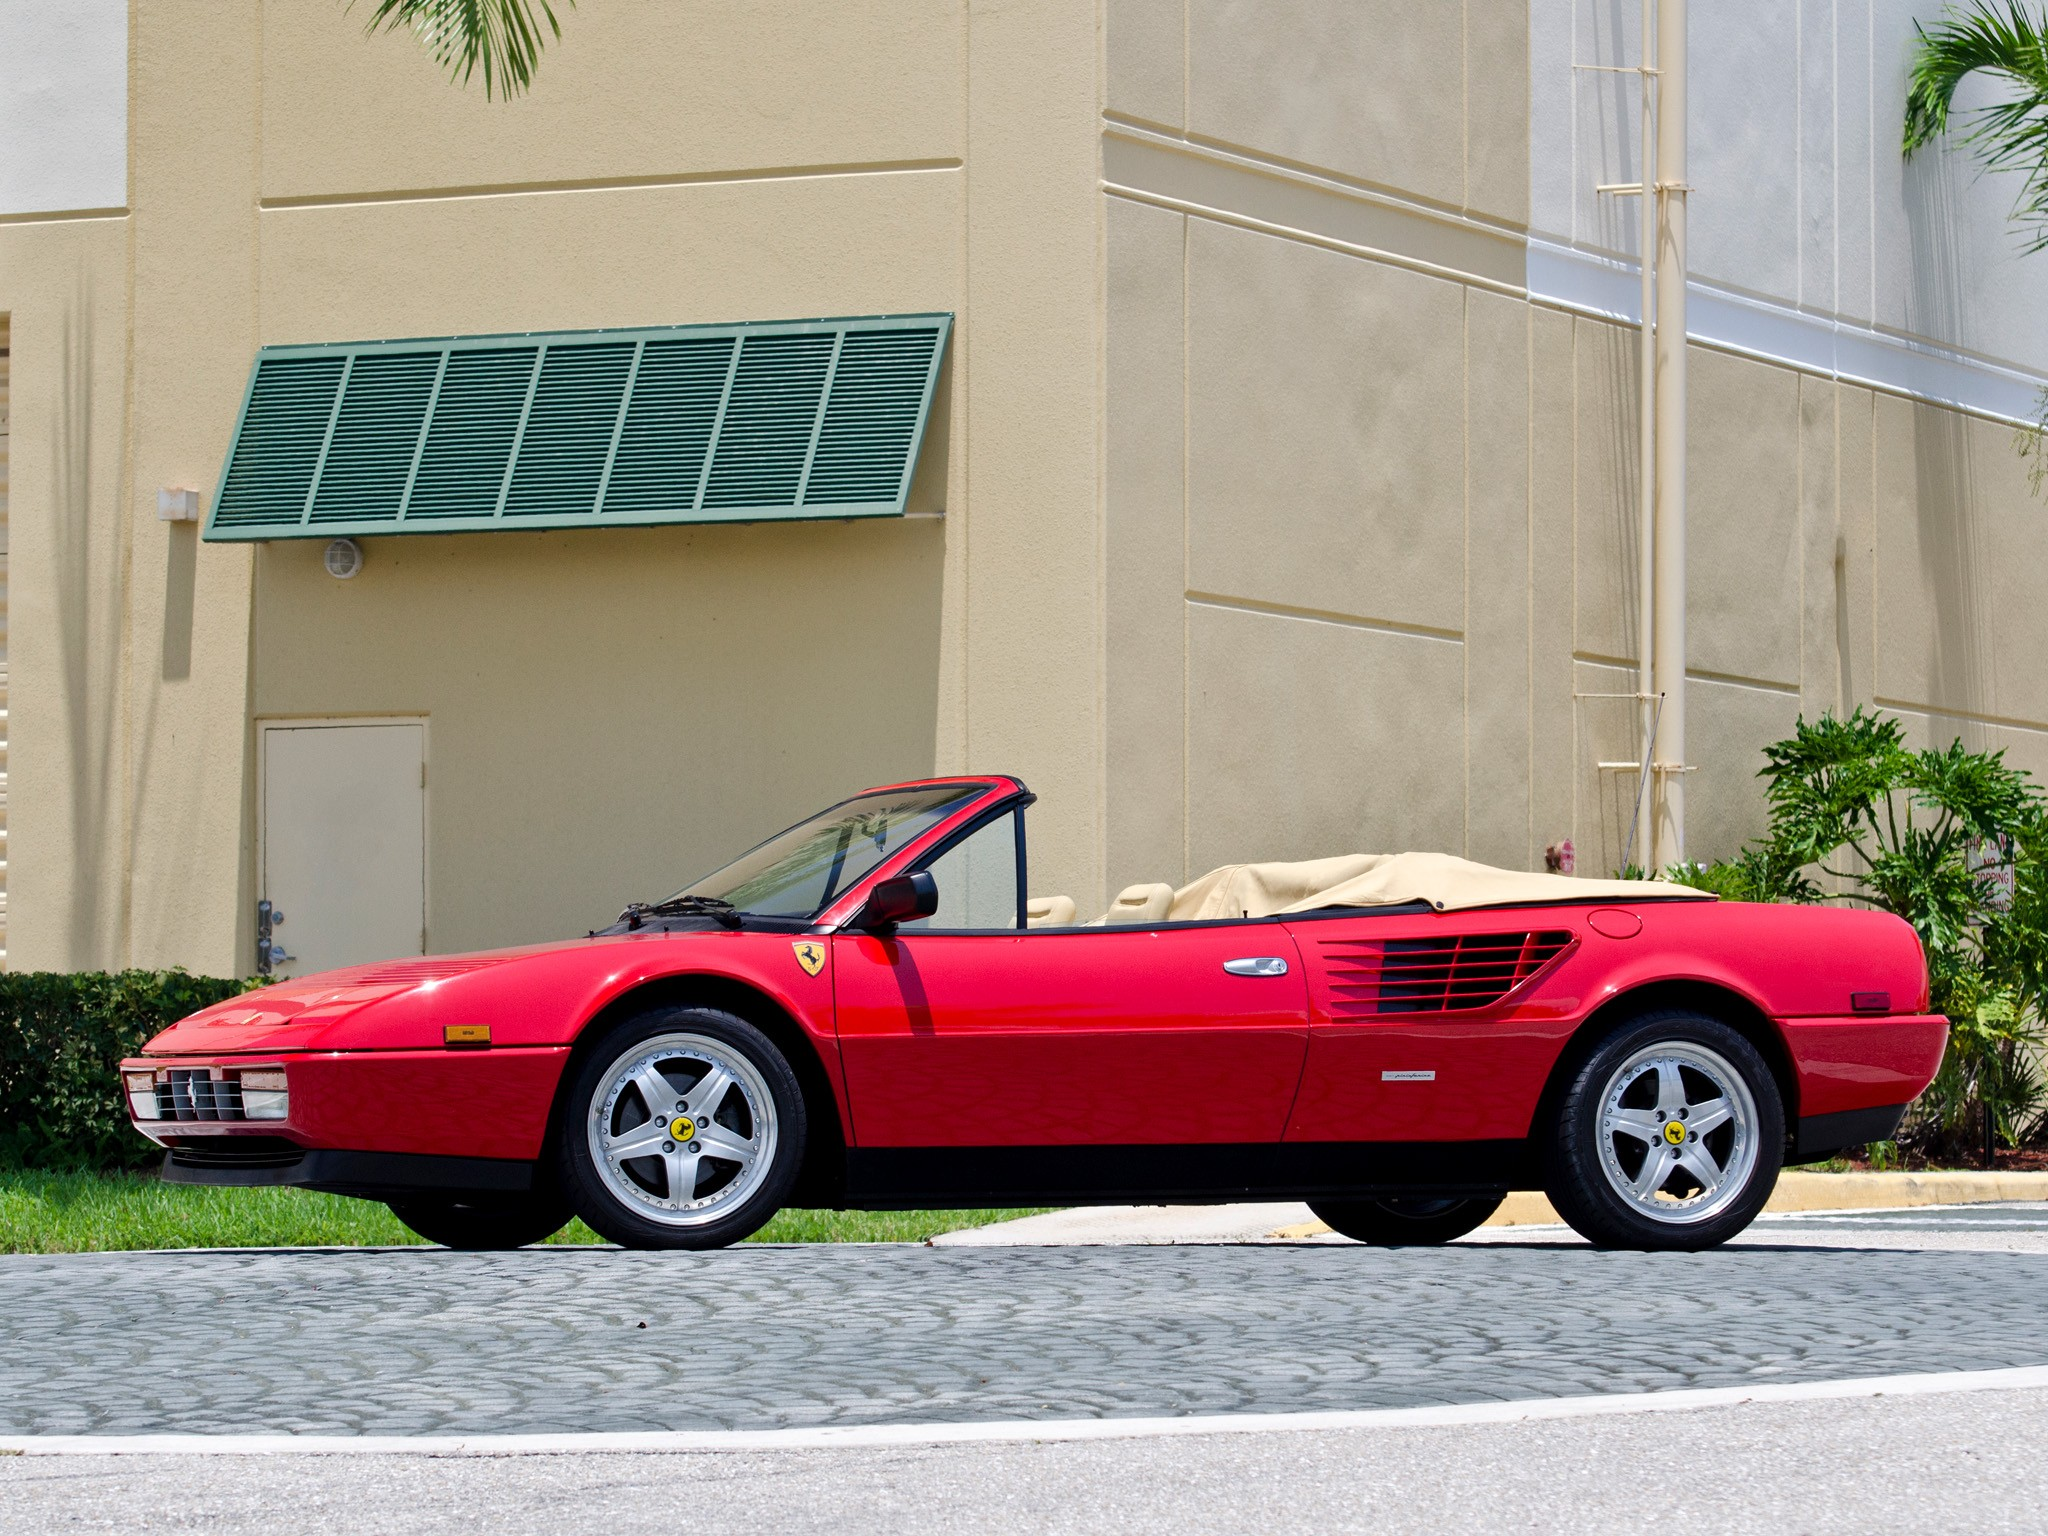 FERRARI-Mondial-3-2-Cabriolet-5510_9 Gorgeous Ferrari Mondial 3.2 Cabriolet V8 Quattrovalvole Cars Trend